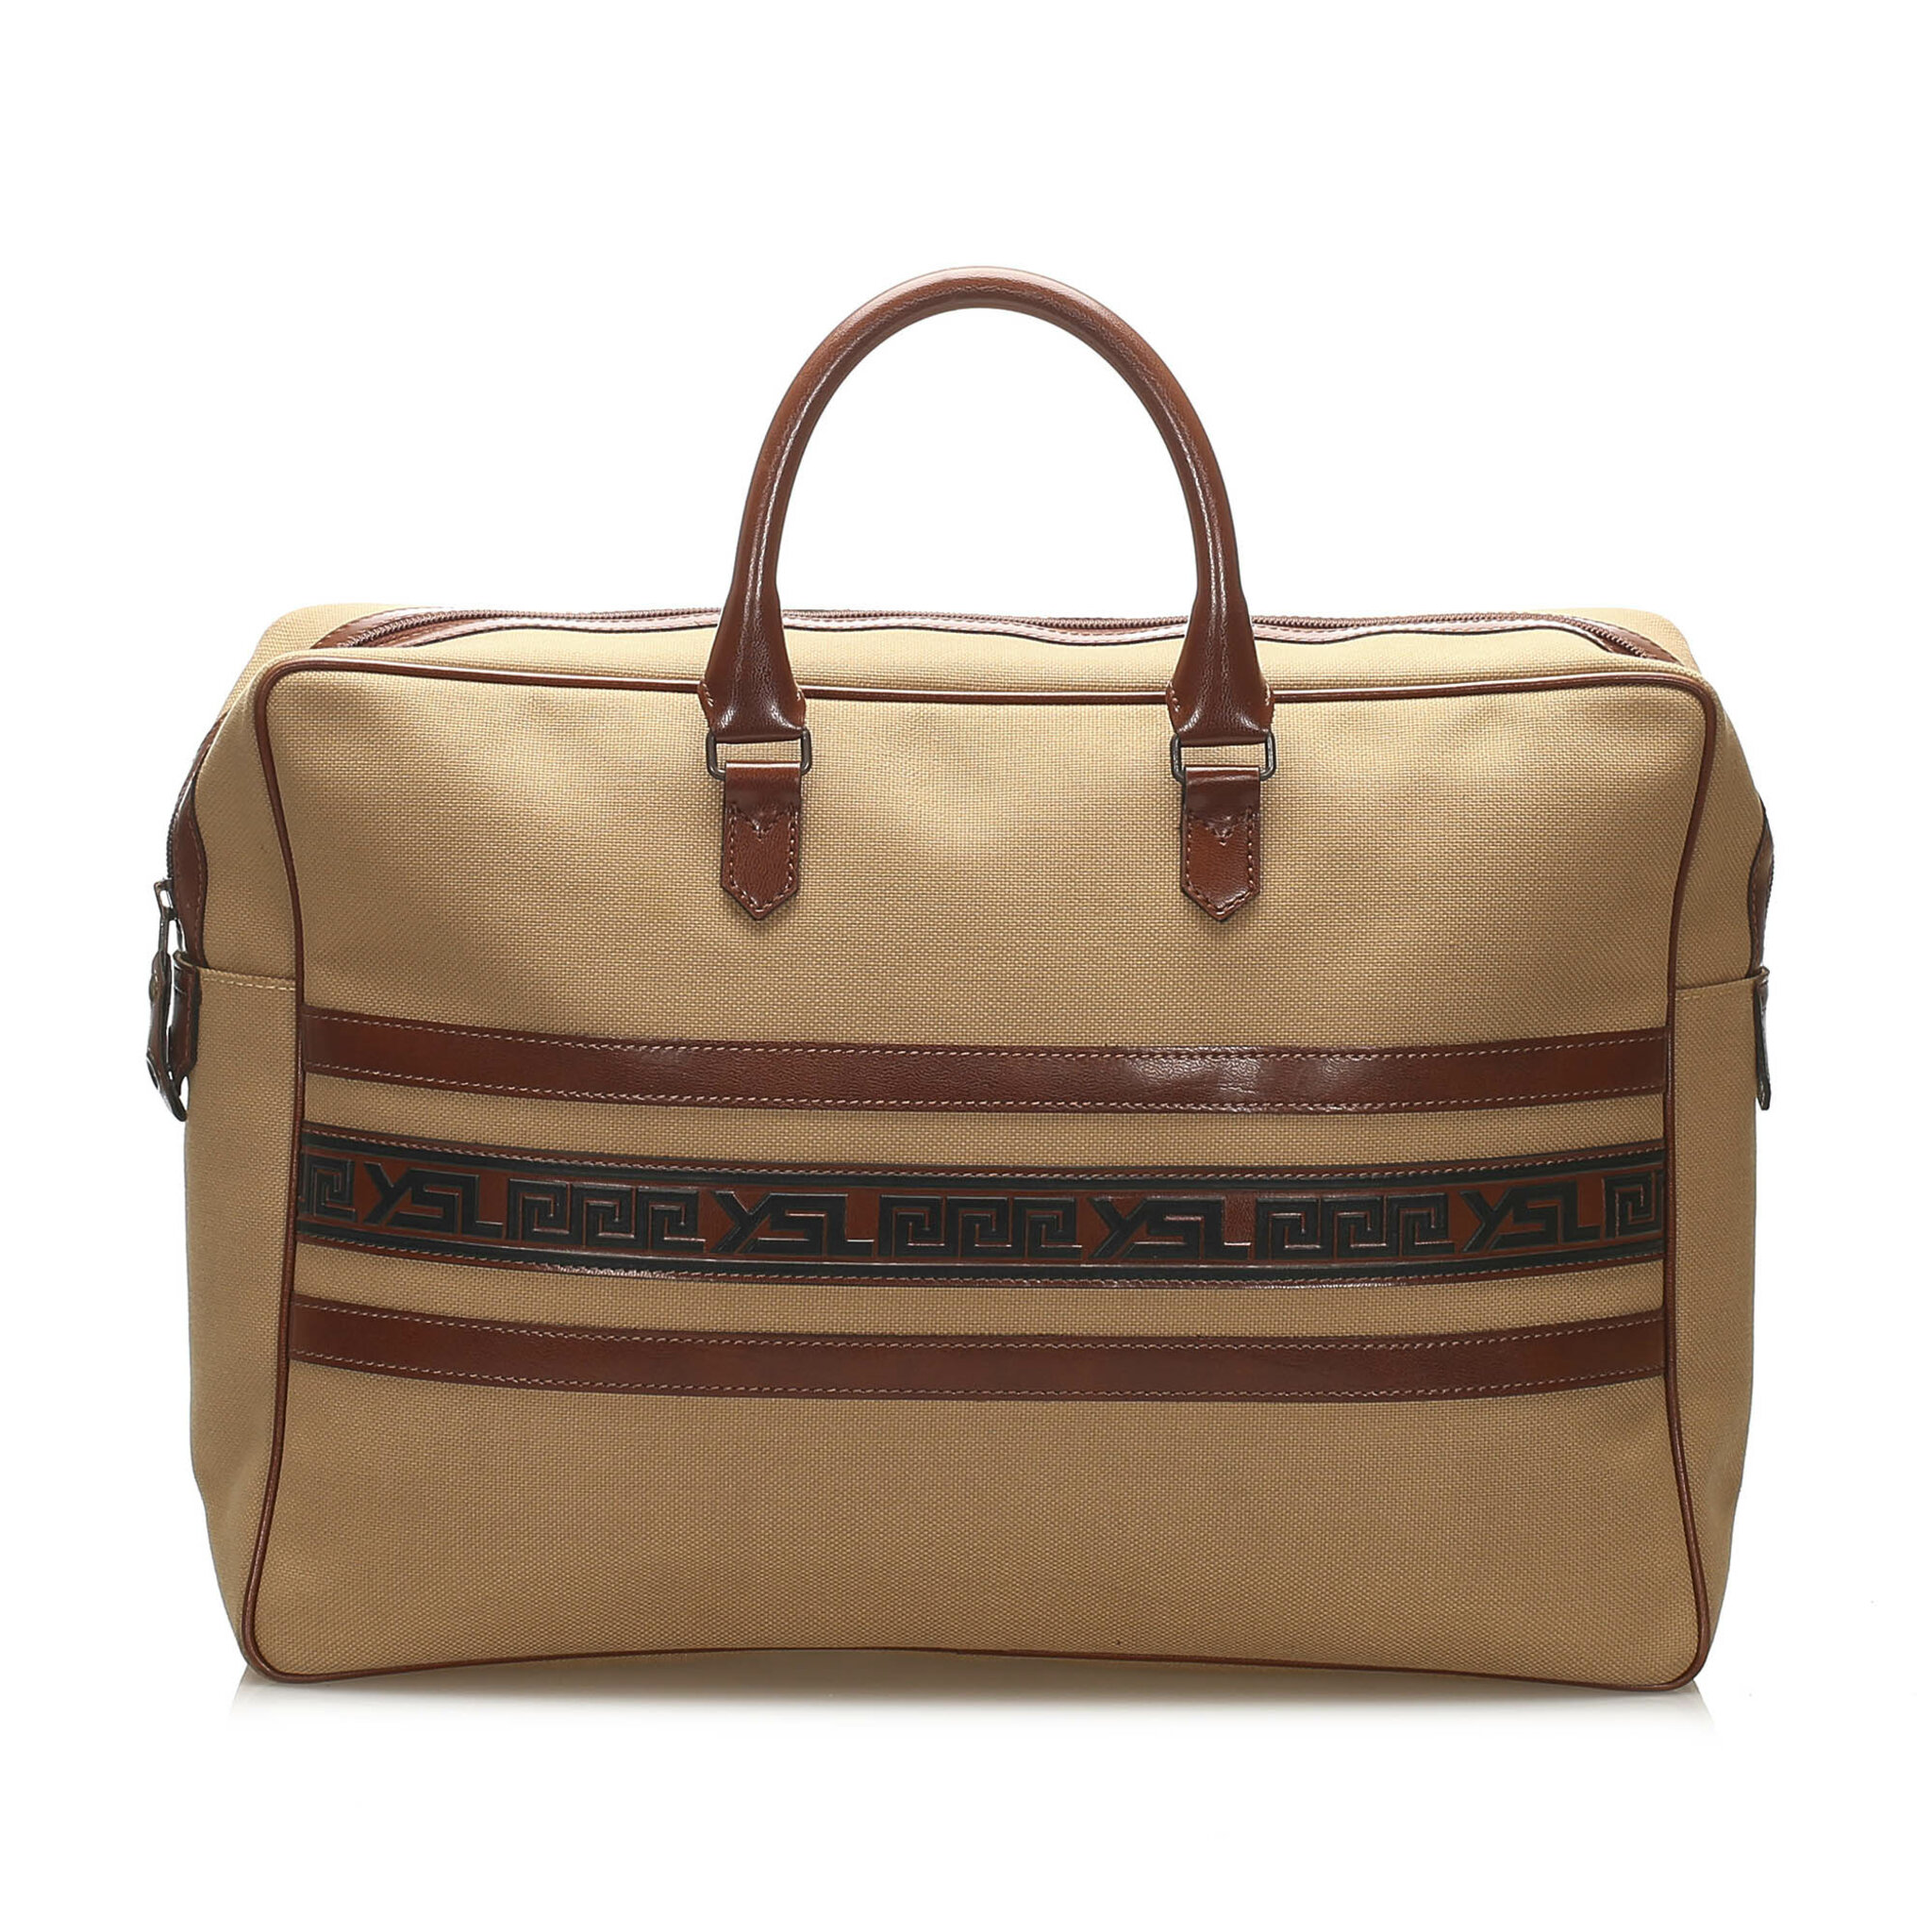 Ysl Canvas Business Bag